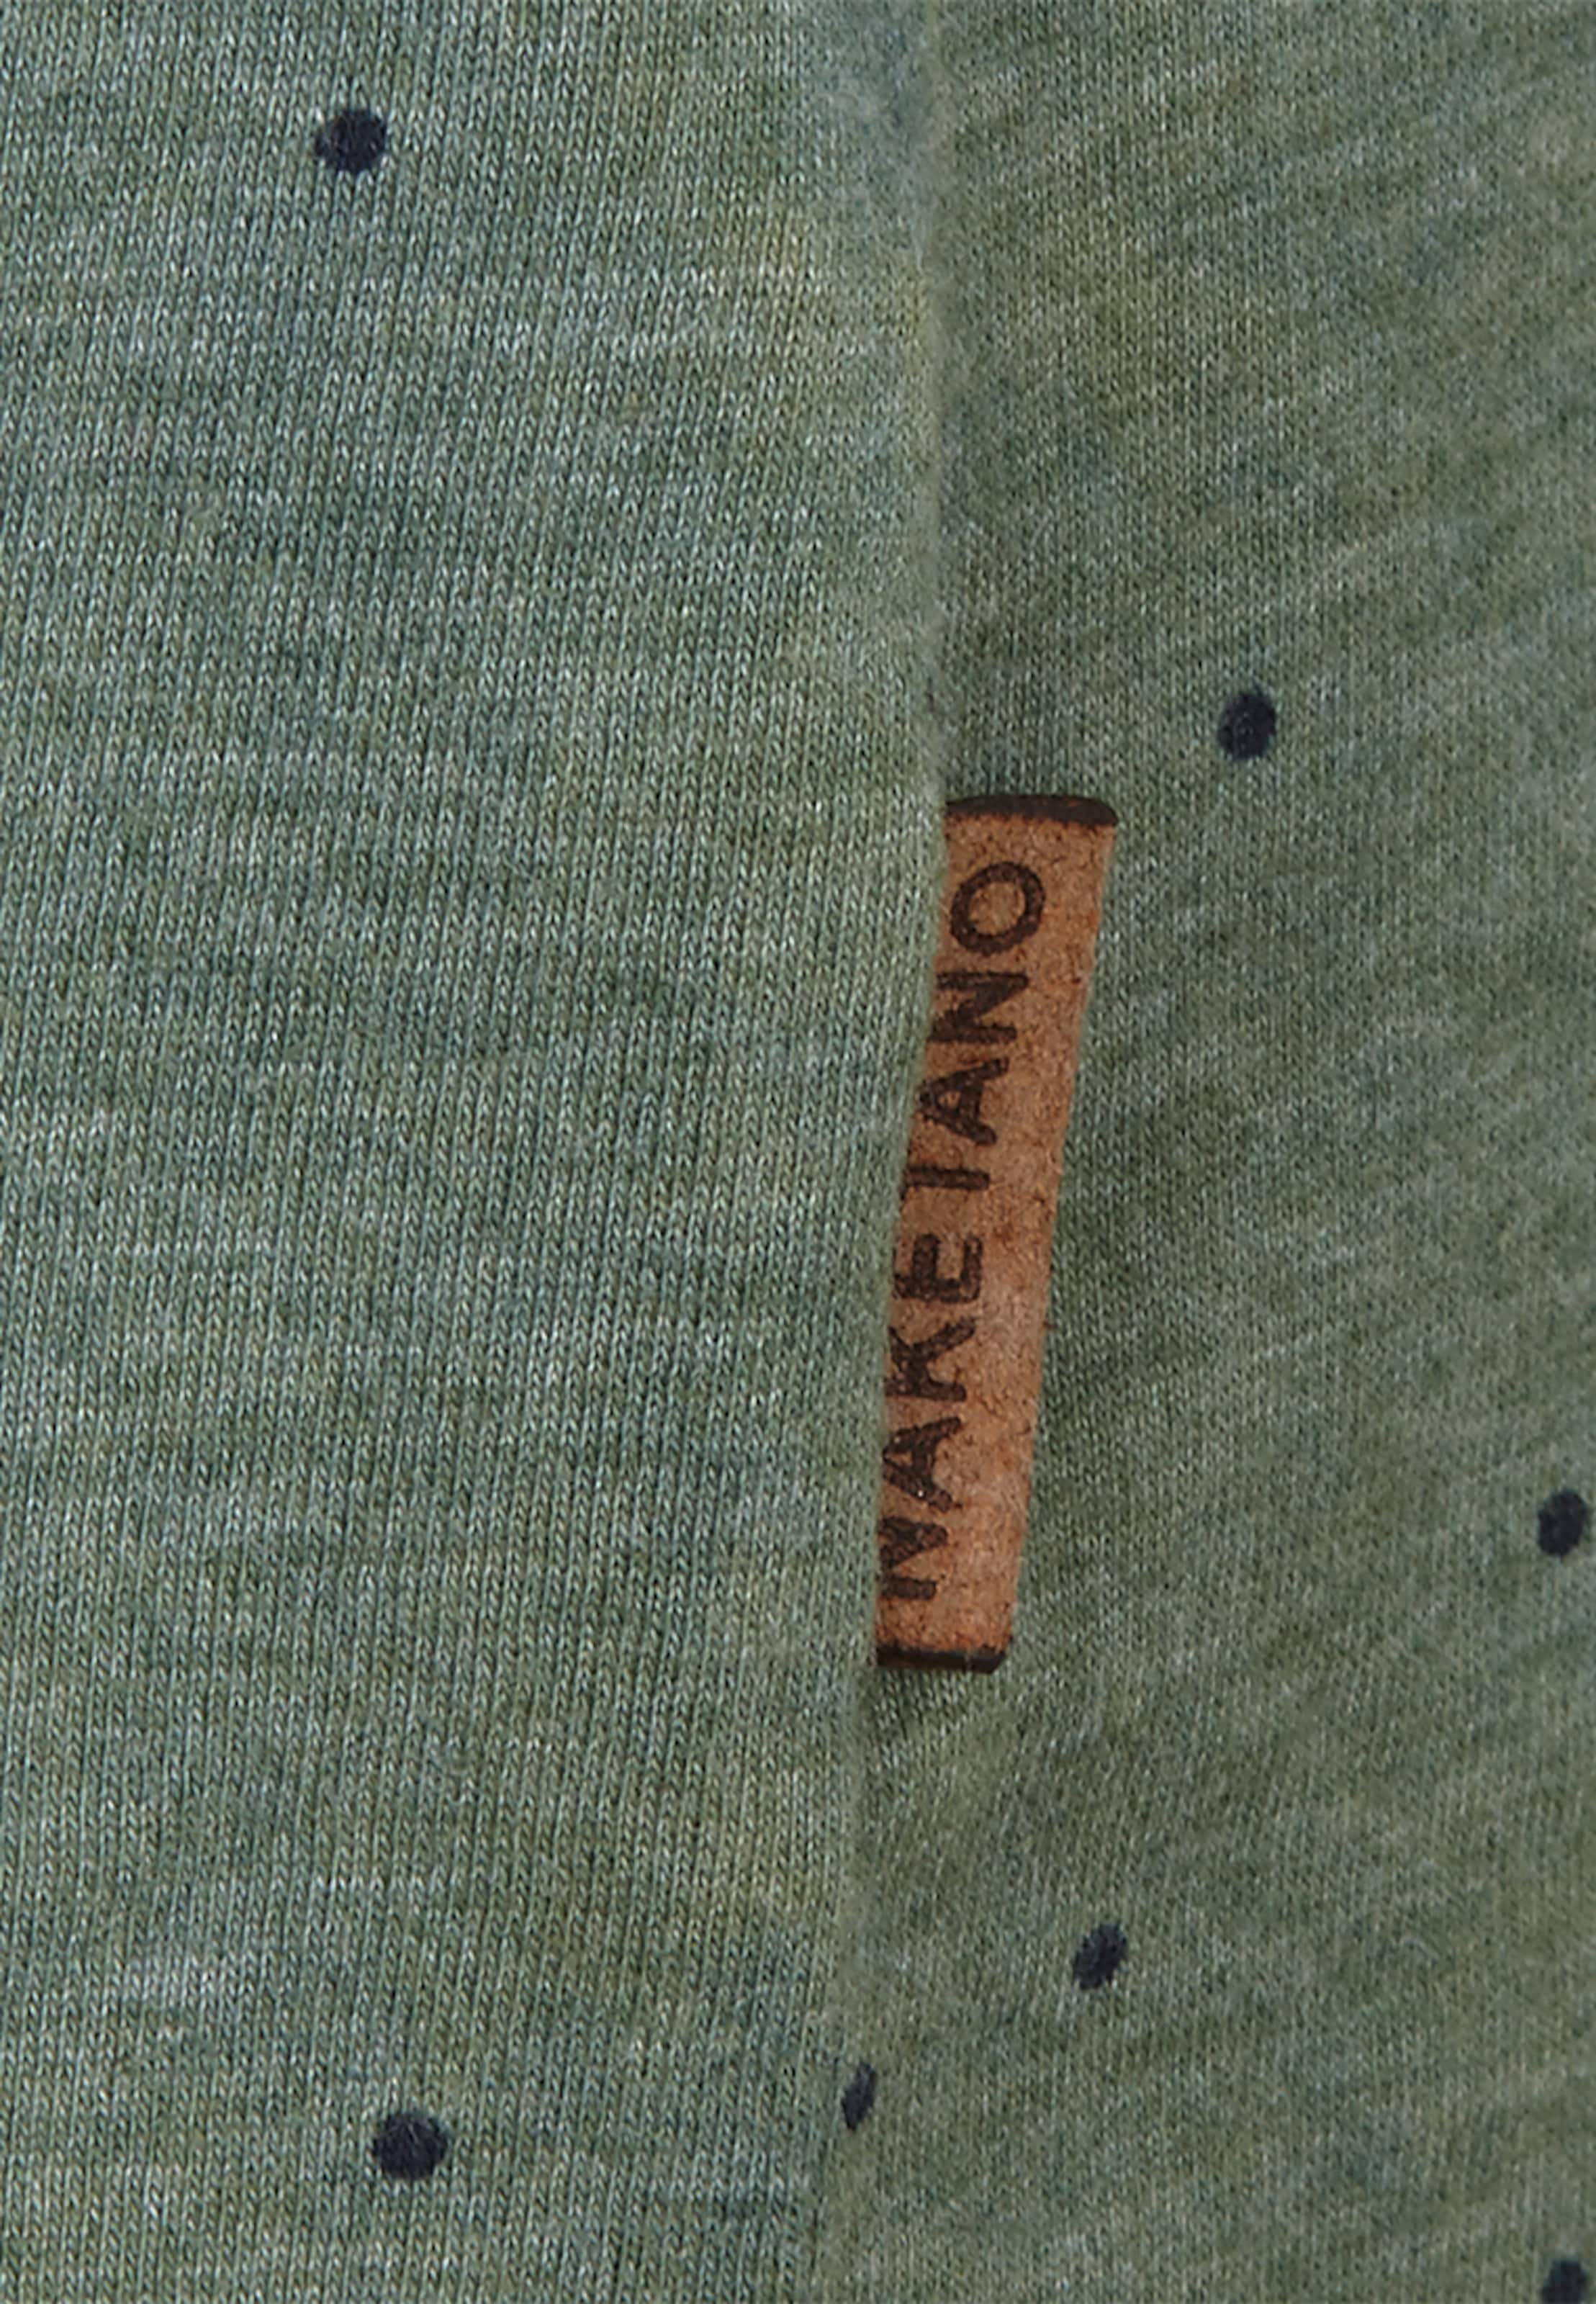 Spielraum Billig naketano T-Shirt 'Fear Will Find You III' Rabatt Footaction RWpUQ